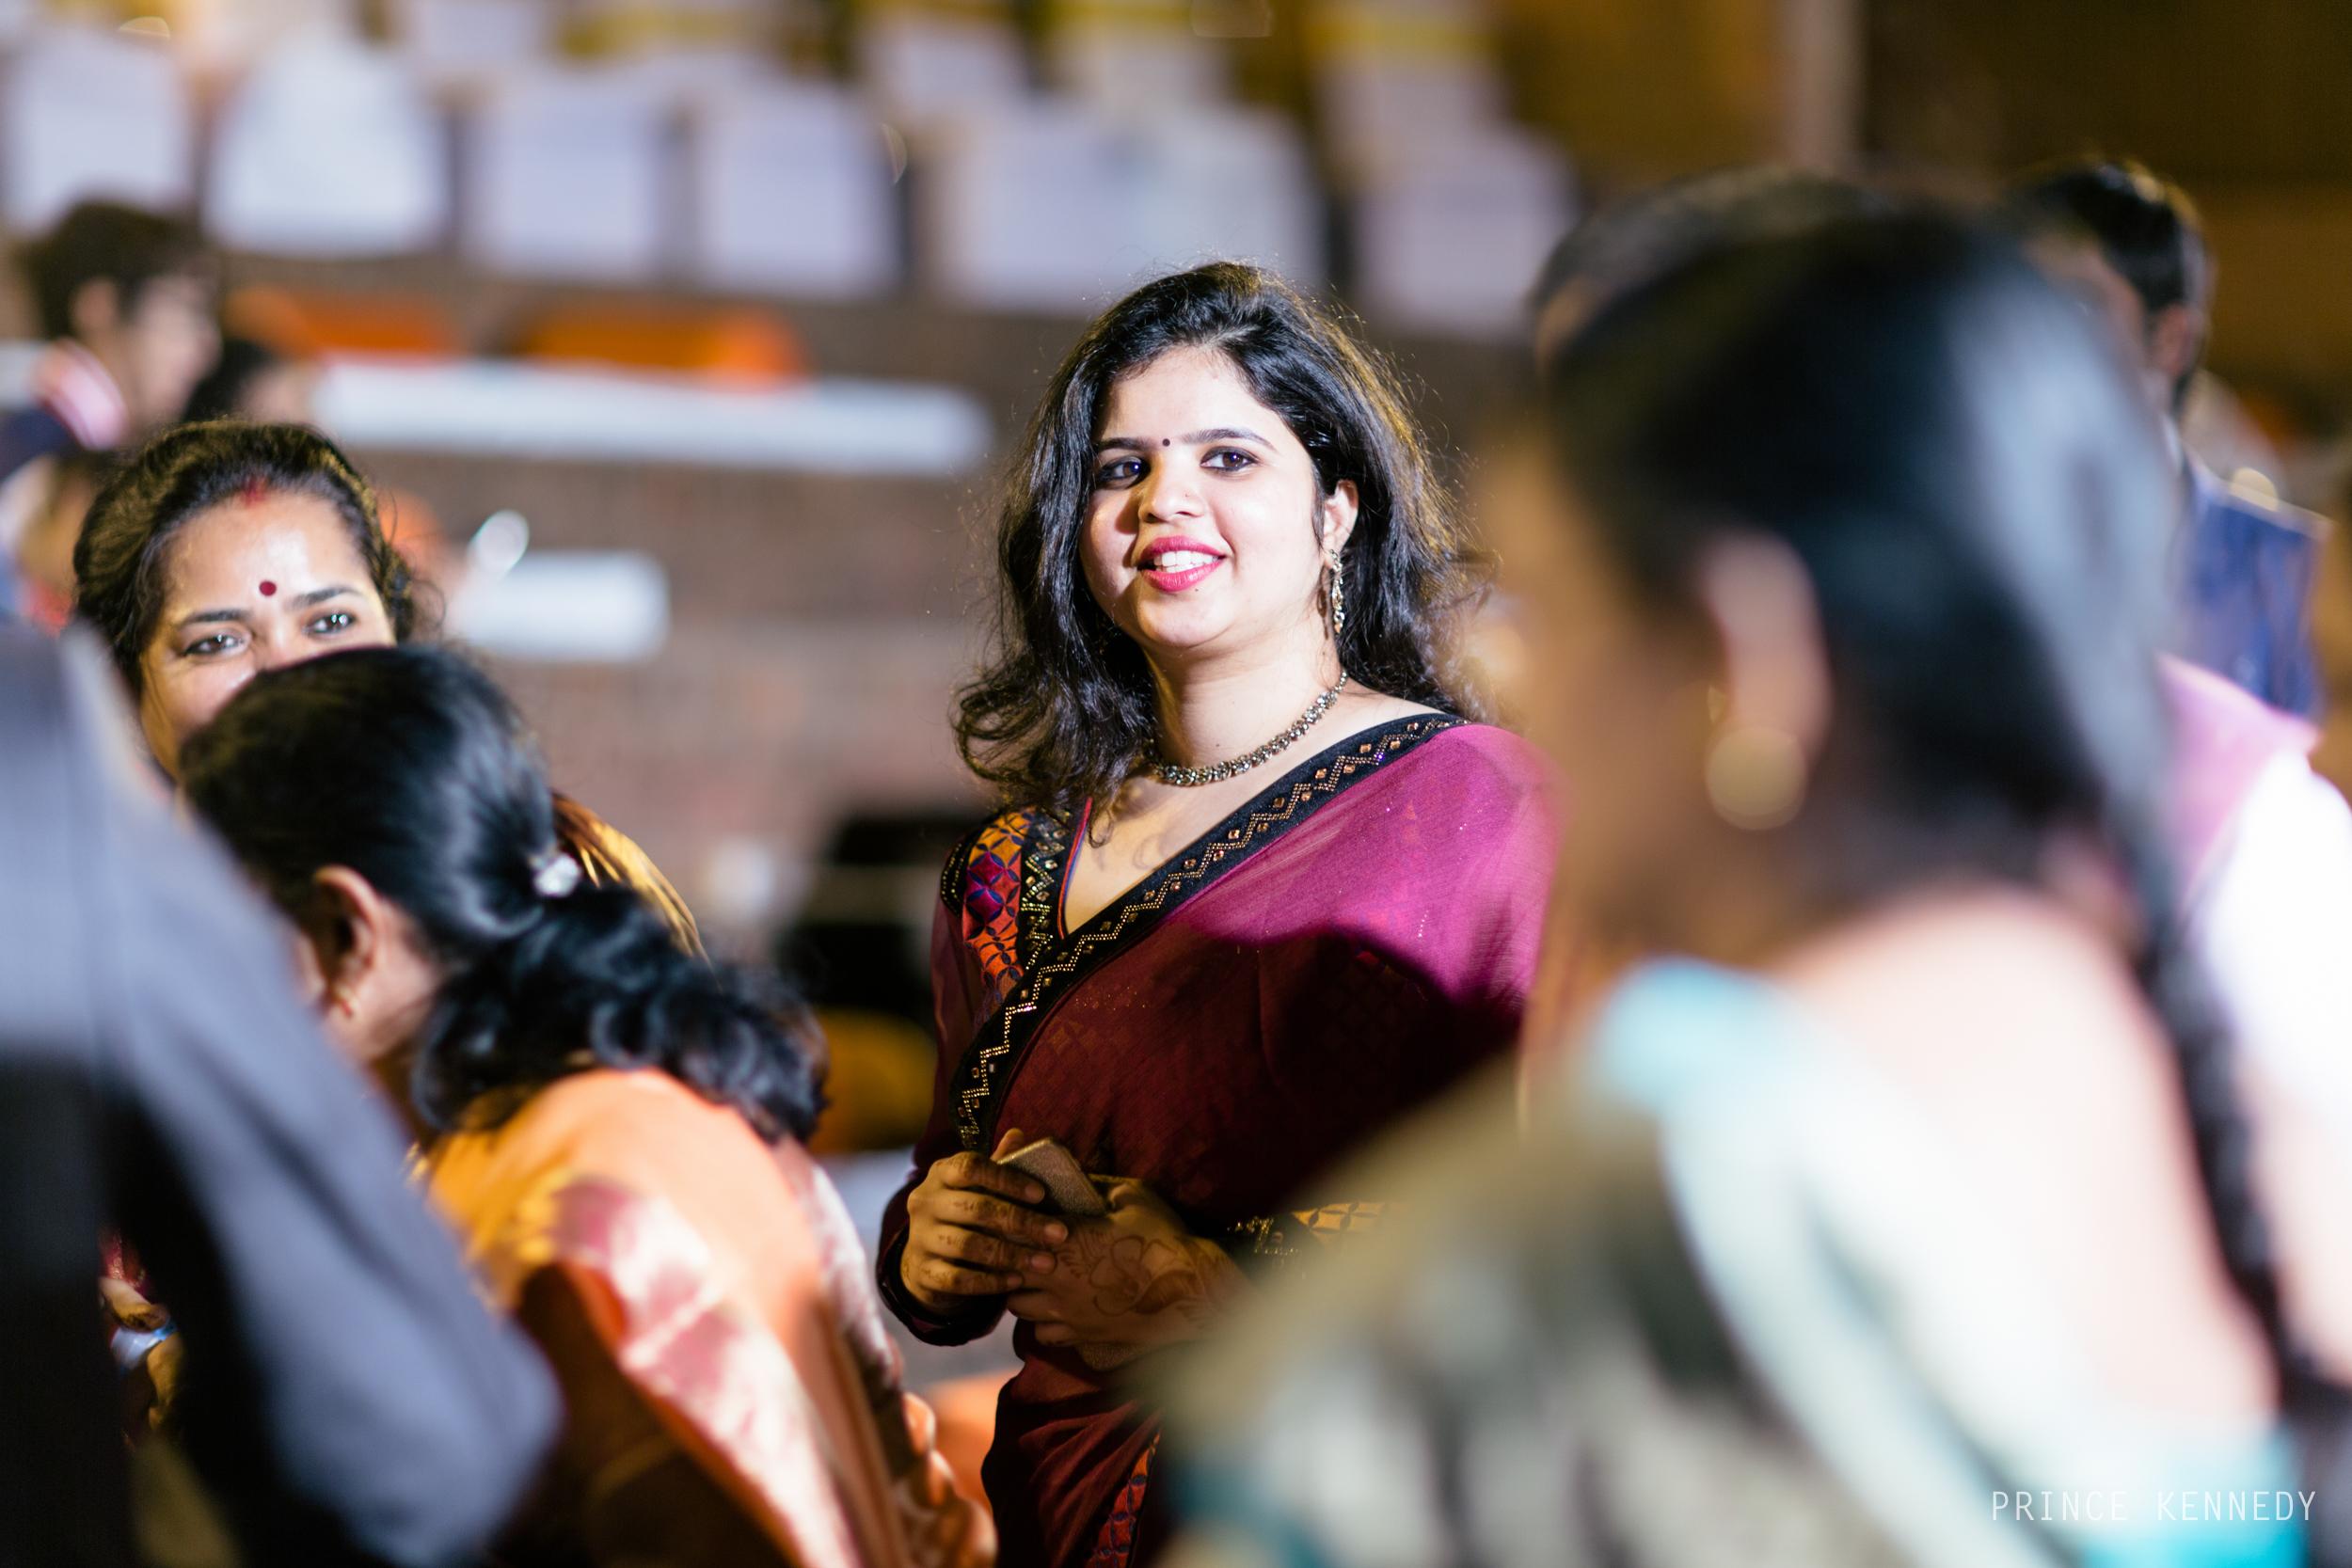 Athmajja-Nithesh-Engagement-Couple-Portrait-Portraiture-Wedding-Couple-Portrait-Chennai-Photographer-Candid-Photography-Destination-Best-Prince-Kennedy-Photography-153.jpg